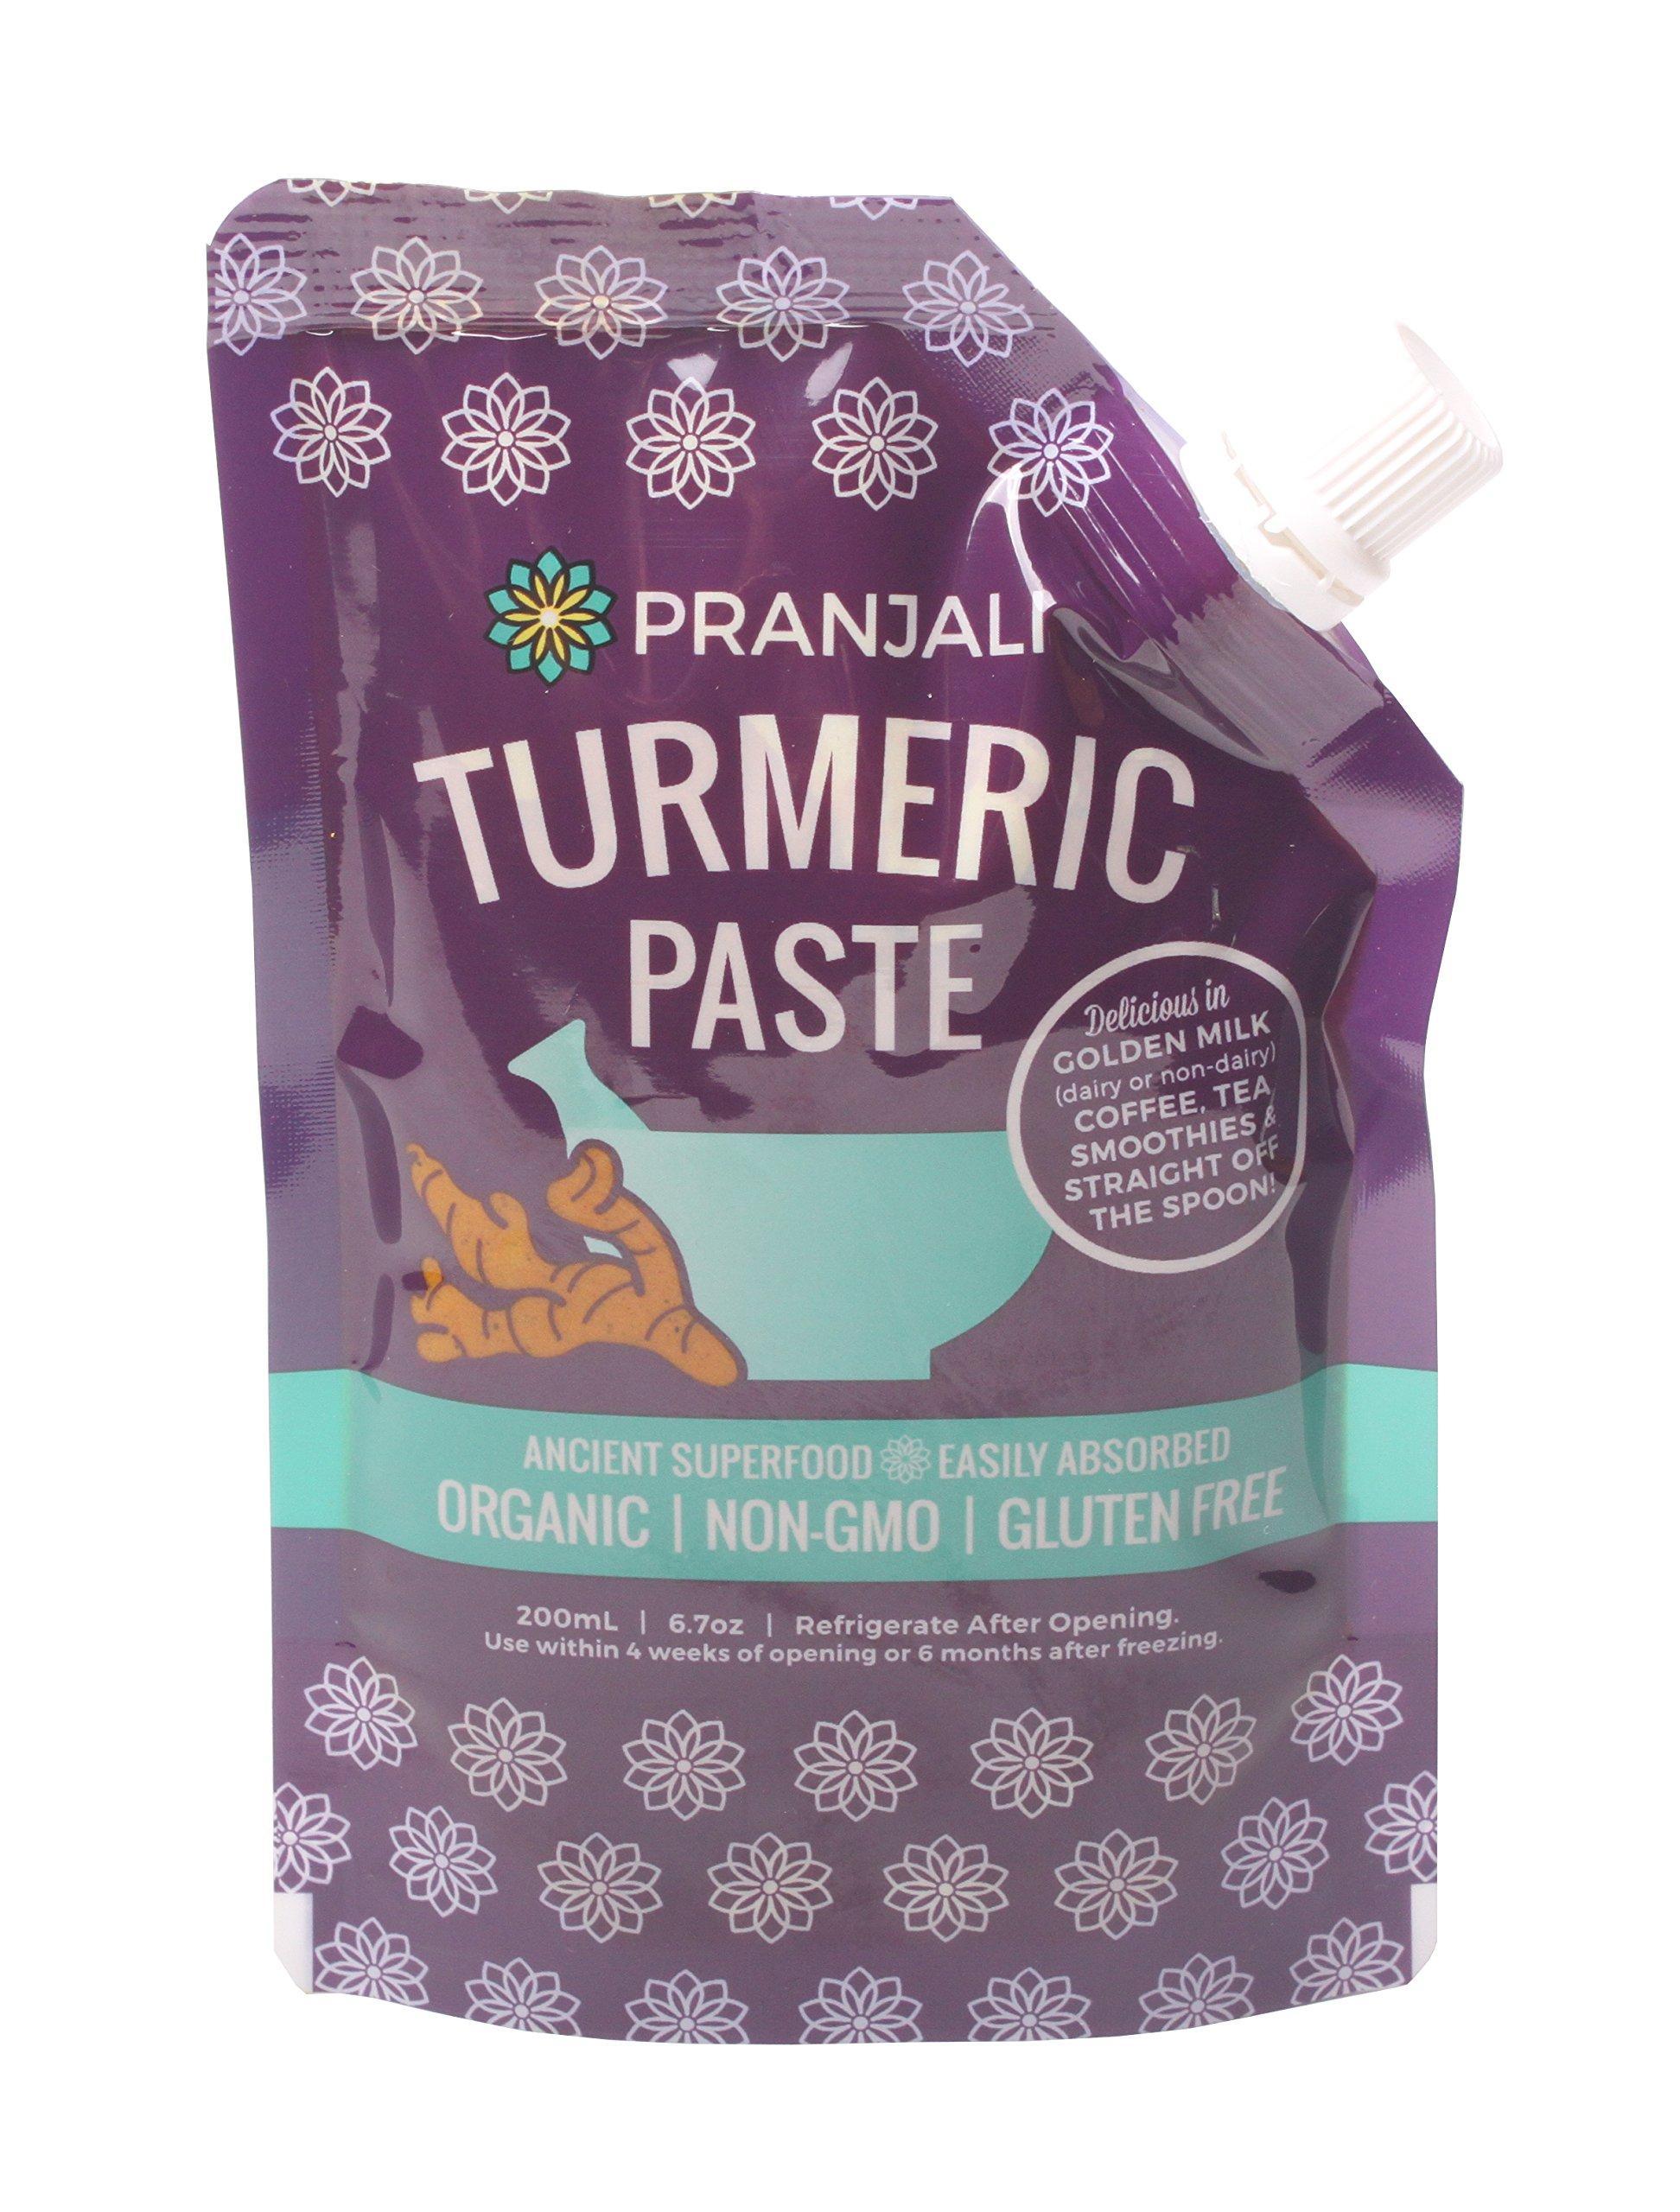 Pranjali Turmeric Paste (Golden Paste), Organic, Non-GMO, Gluten-free, 6.7 ounces